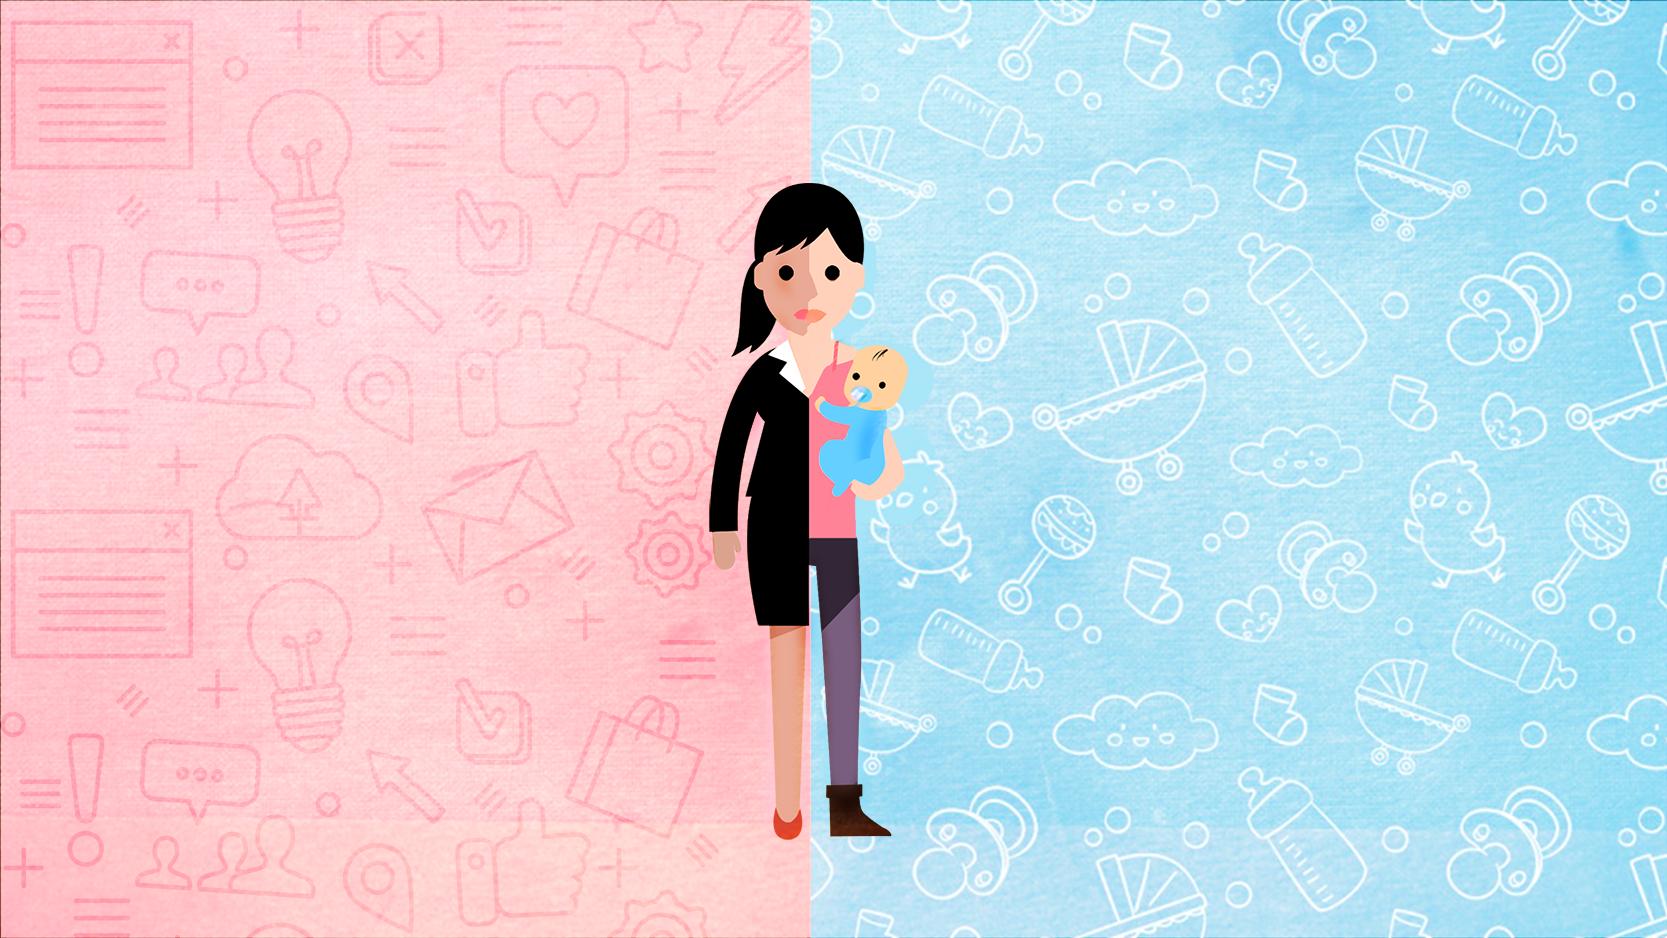 Maternidade na advocacia: que apoios oferecem as sociedades?